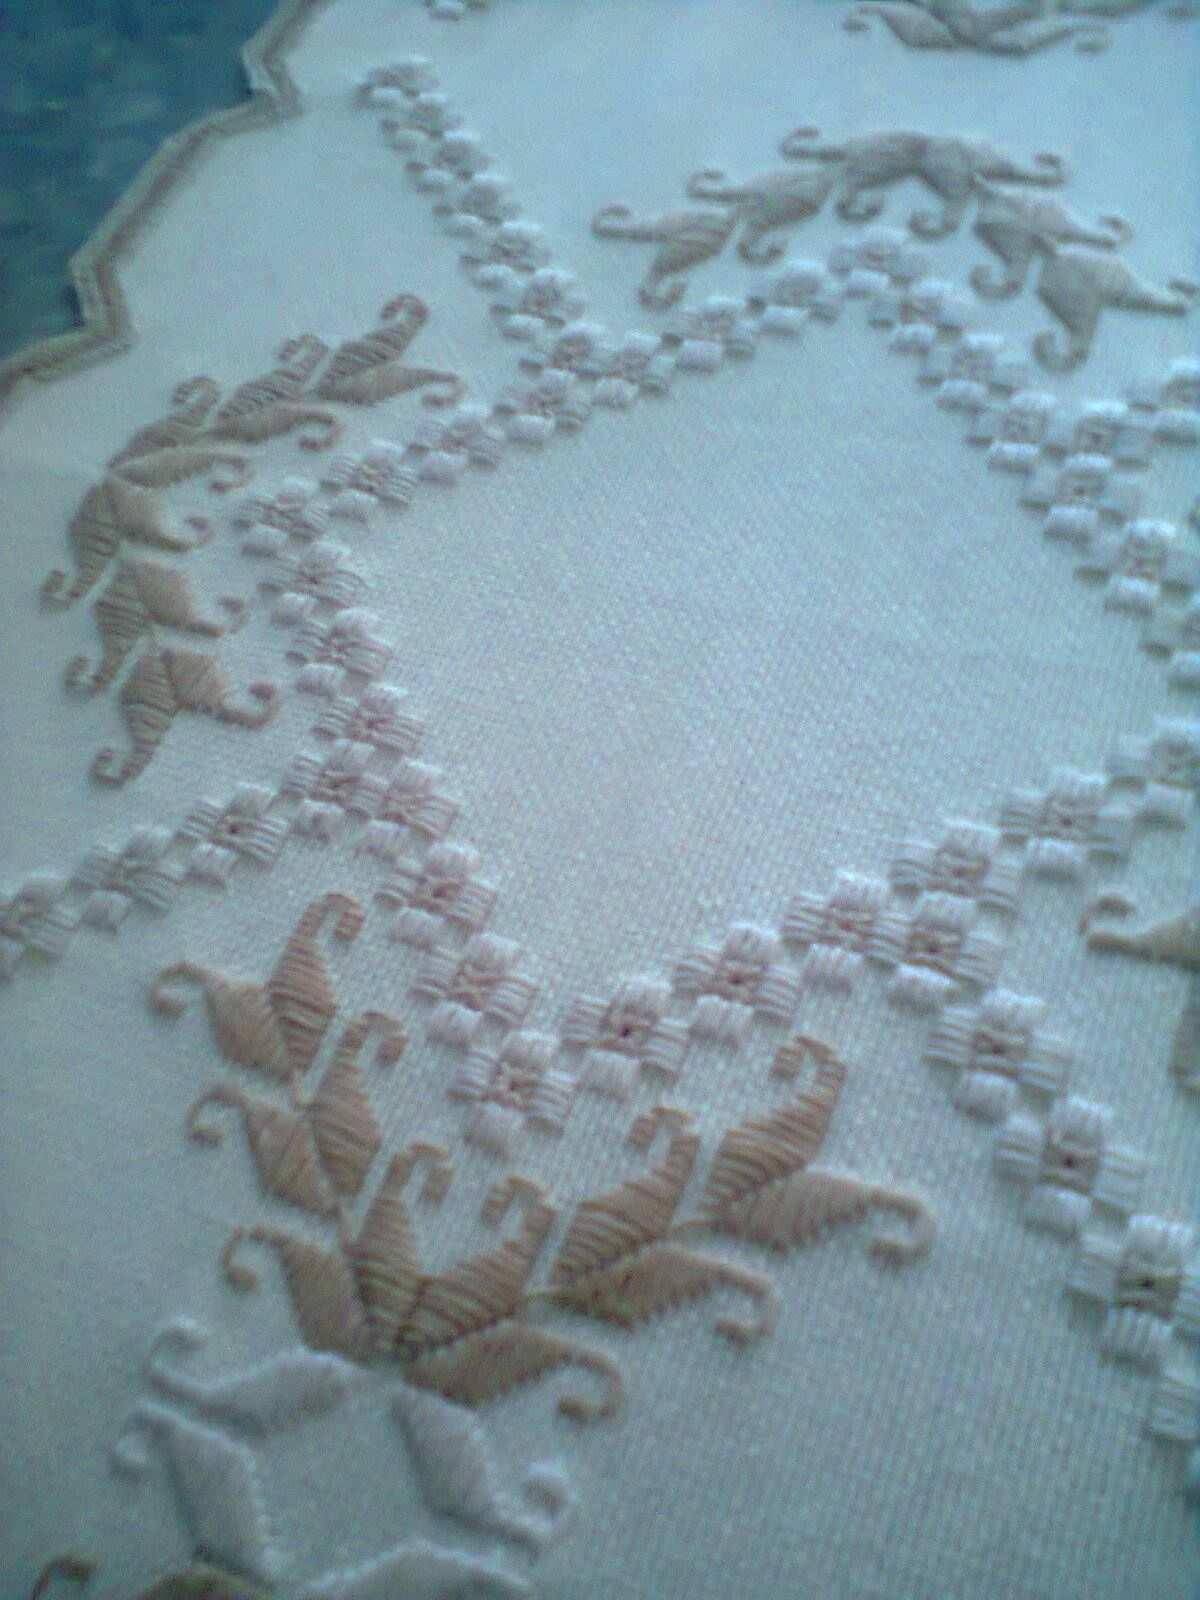 Pin By Rosa Malzan On Hardager Hardanger Embroidery Embroidery Needlework